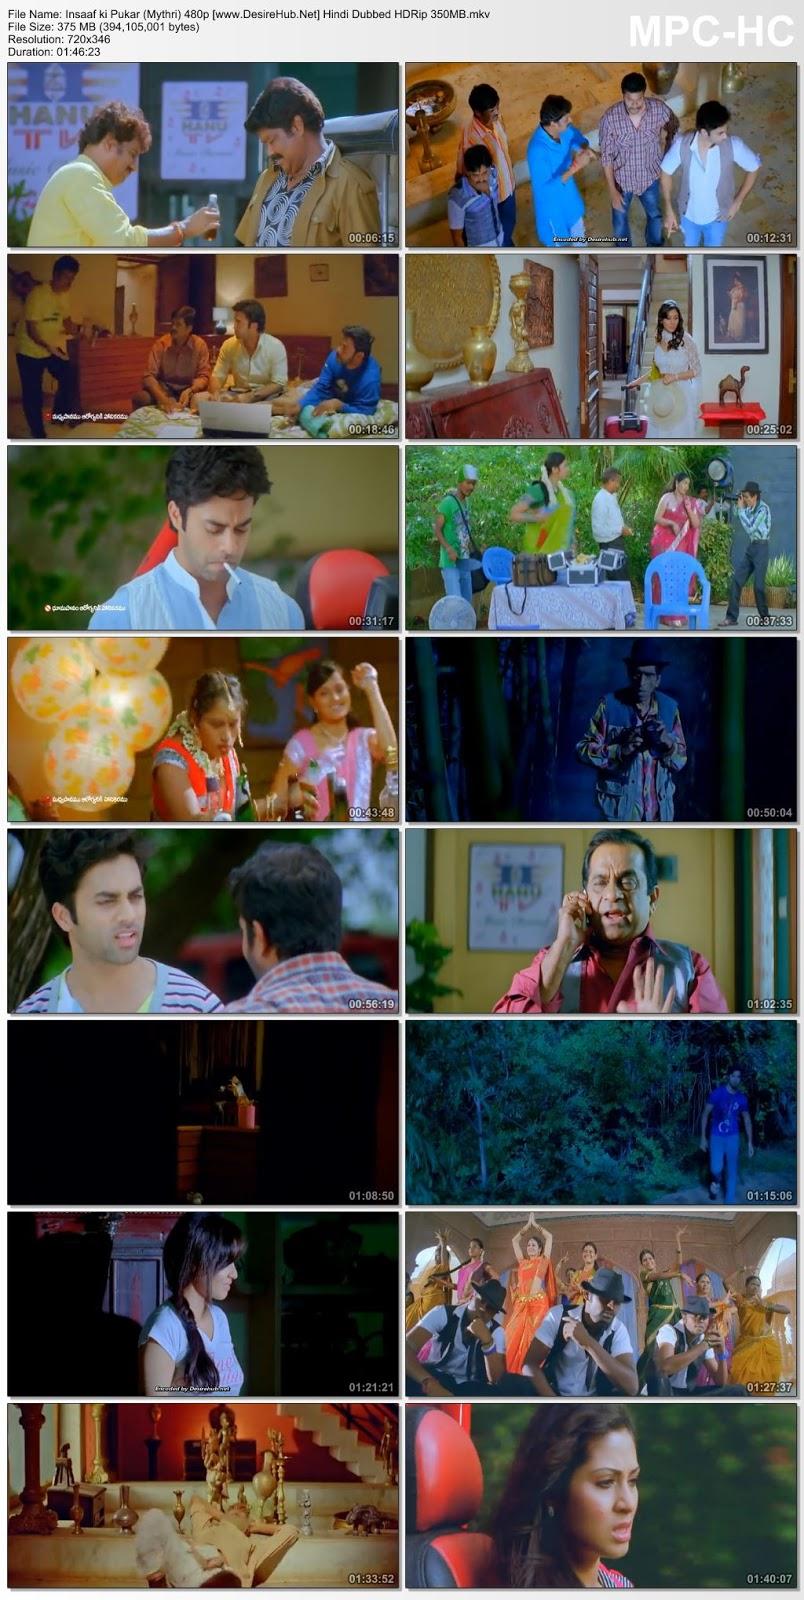 Insaaf ki Pukar (Mythri) 2012 Hindi Dubbed 480p HDRip 350MB Desirehub